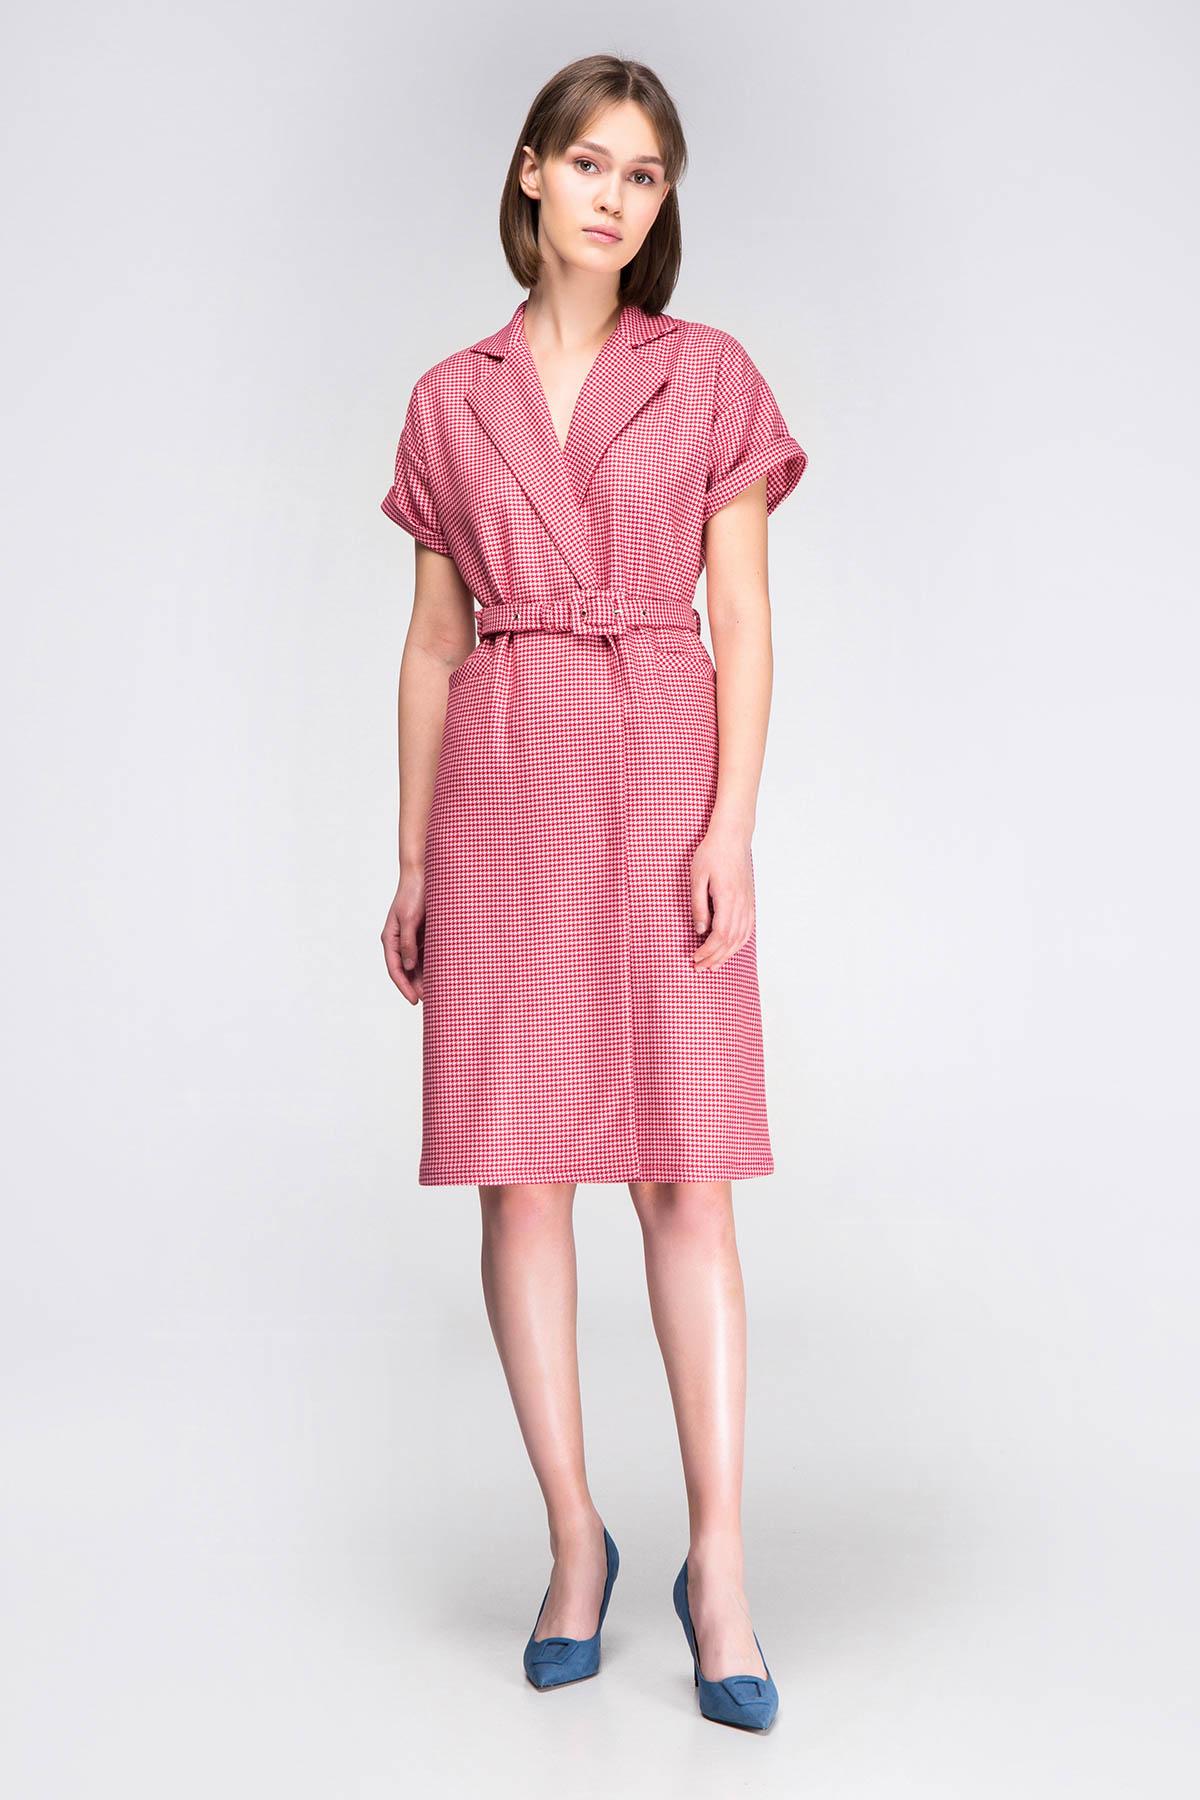 Платье женские MustHave модель 6679 , 2017